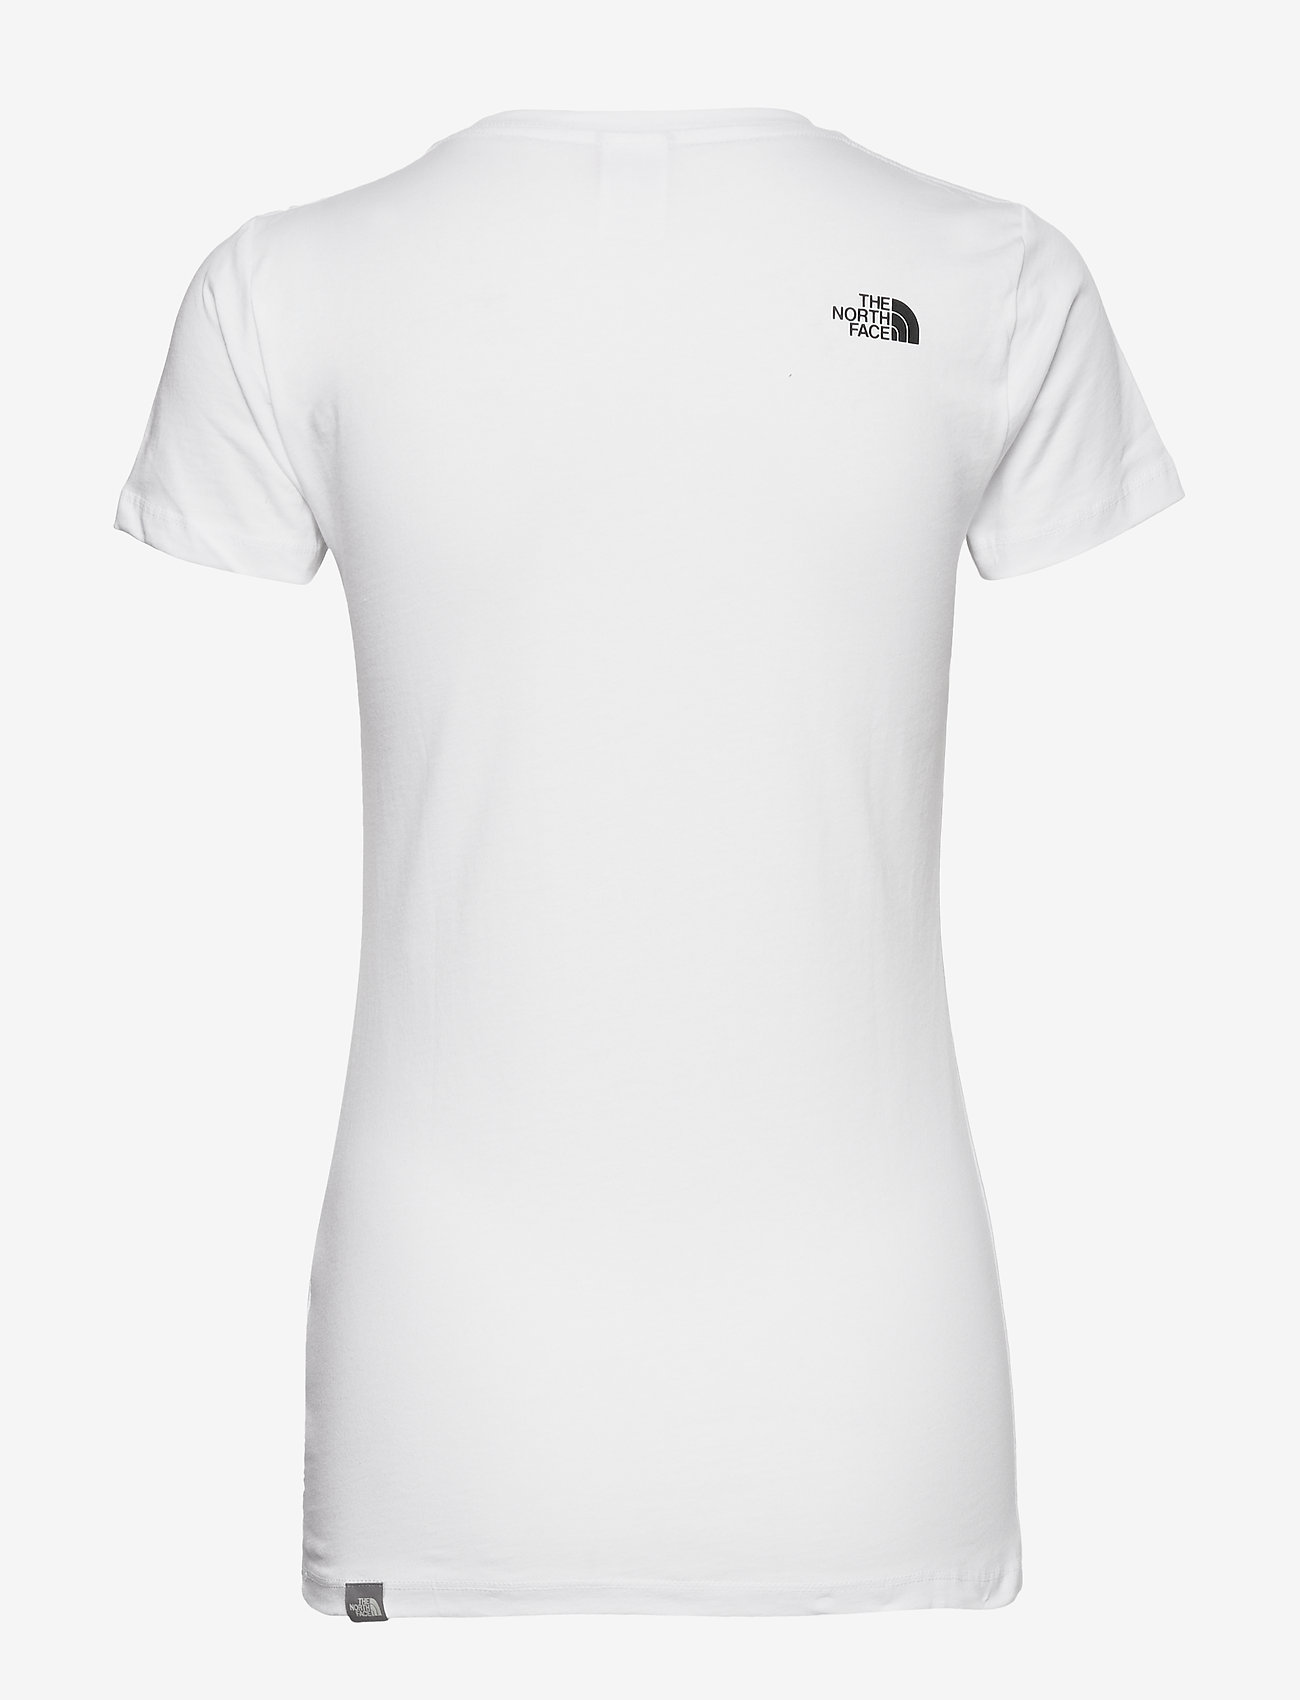 The North Face W S/S EASY TEE - T-shirts & topper TNFWHIT/TNFWHIT - Dameklær Spesialtilbud